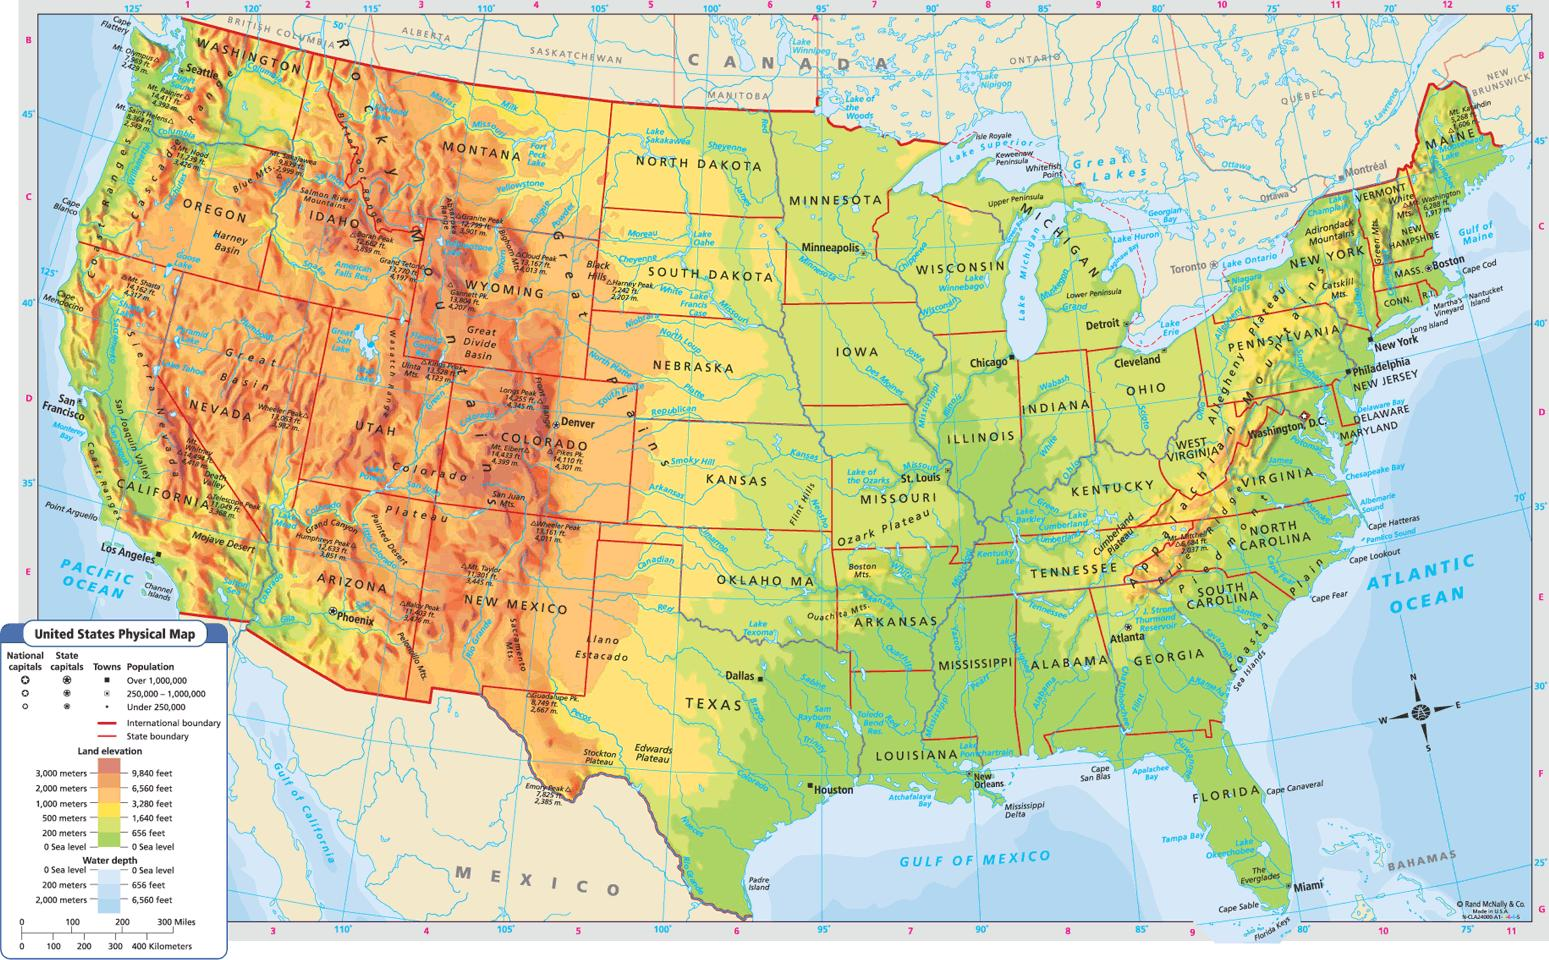 Geograficka Mapa Usa Zemepisna Mapa Spojenych Statu Severni